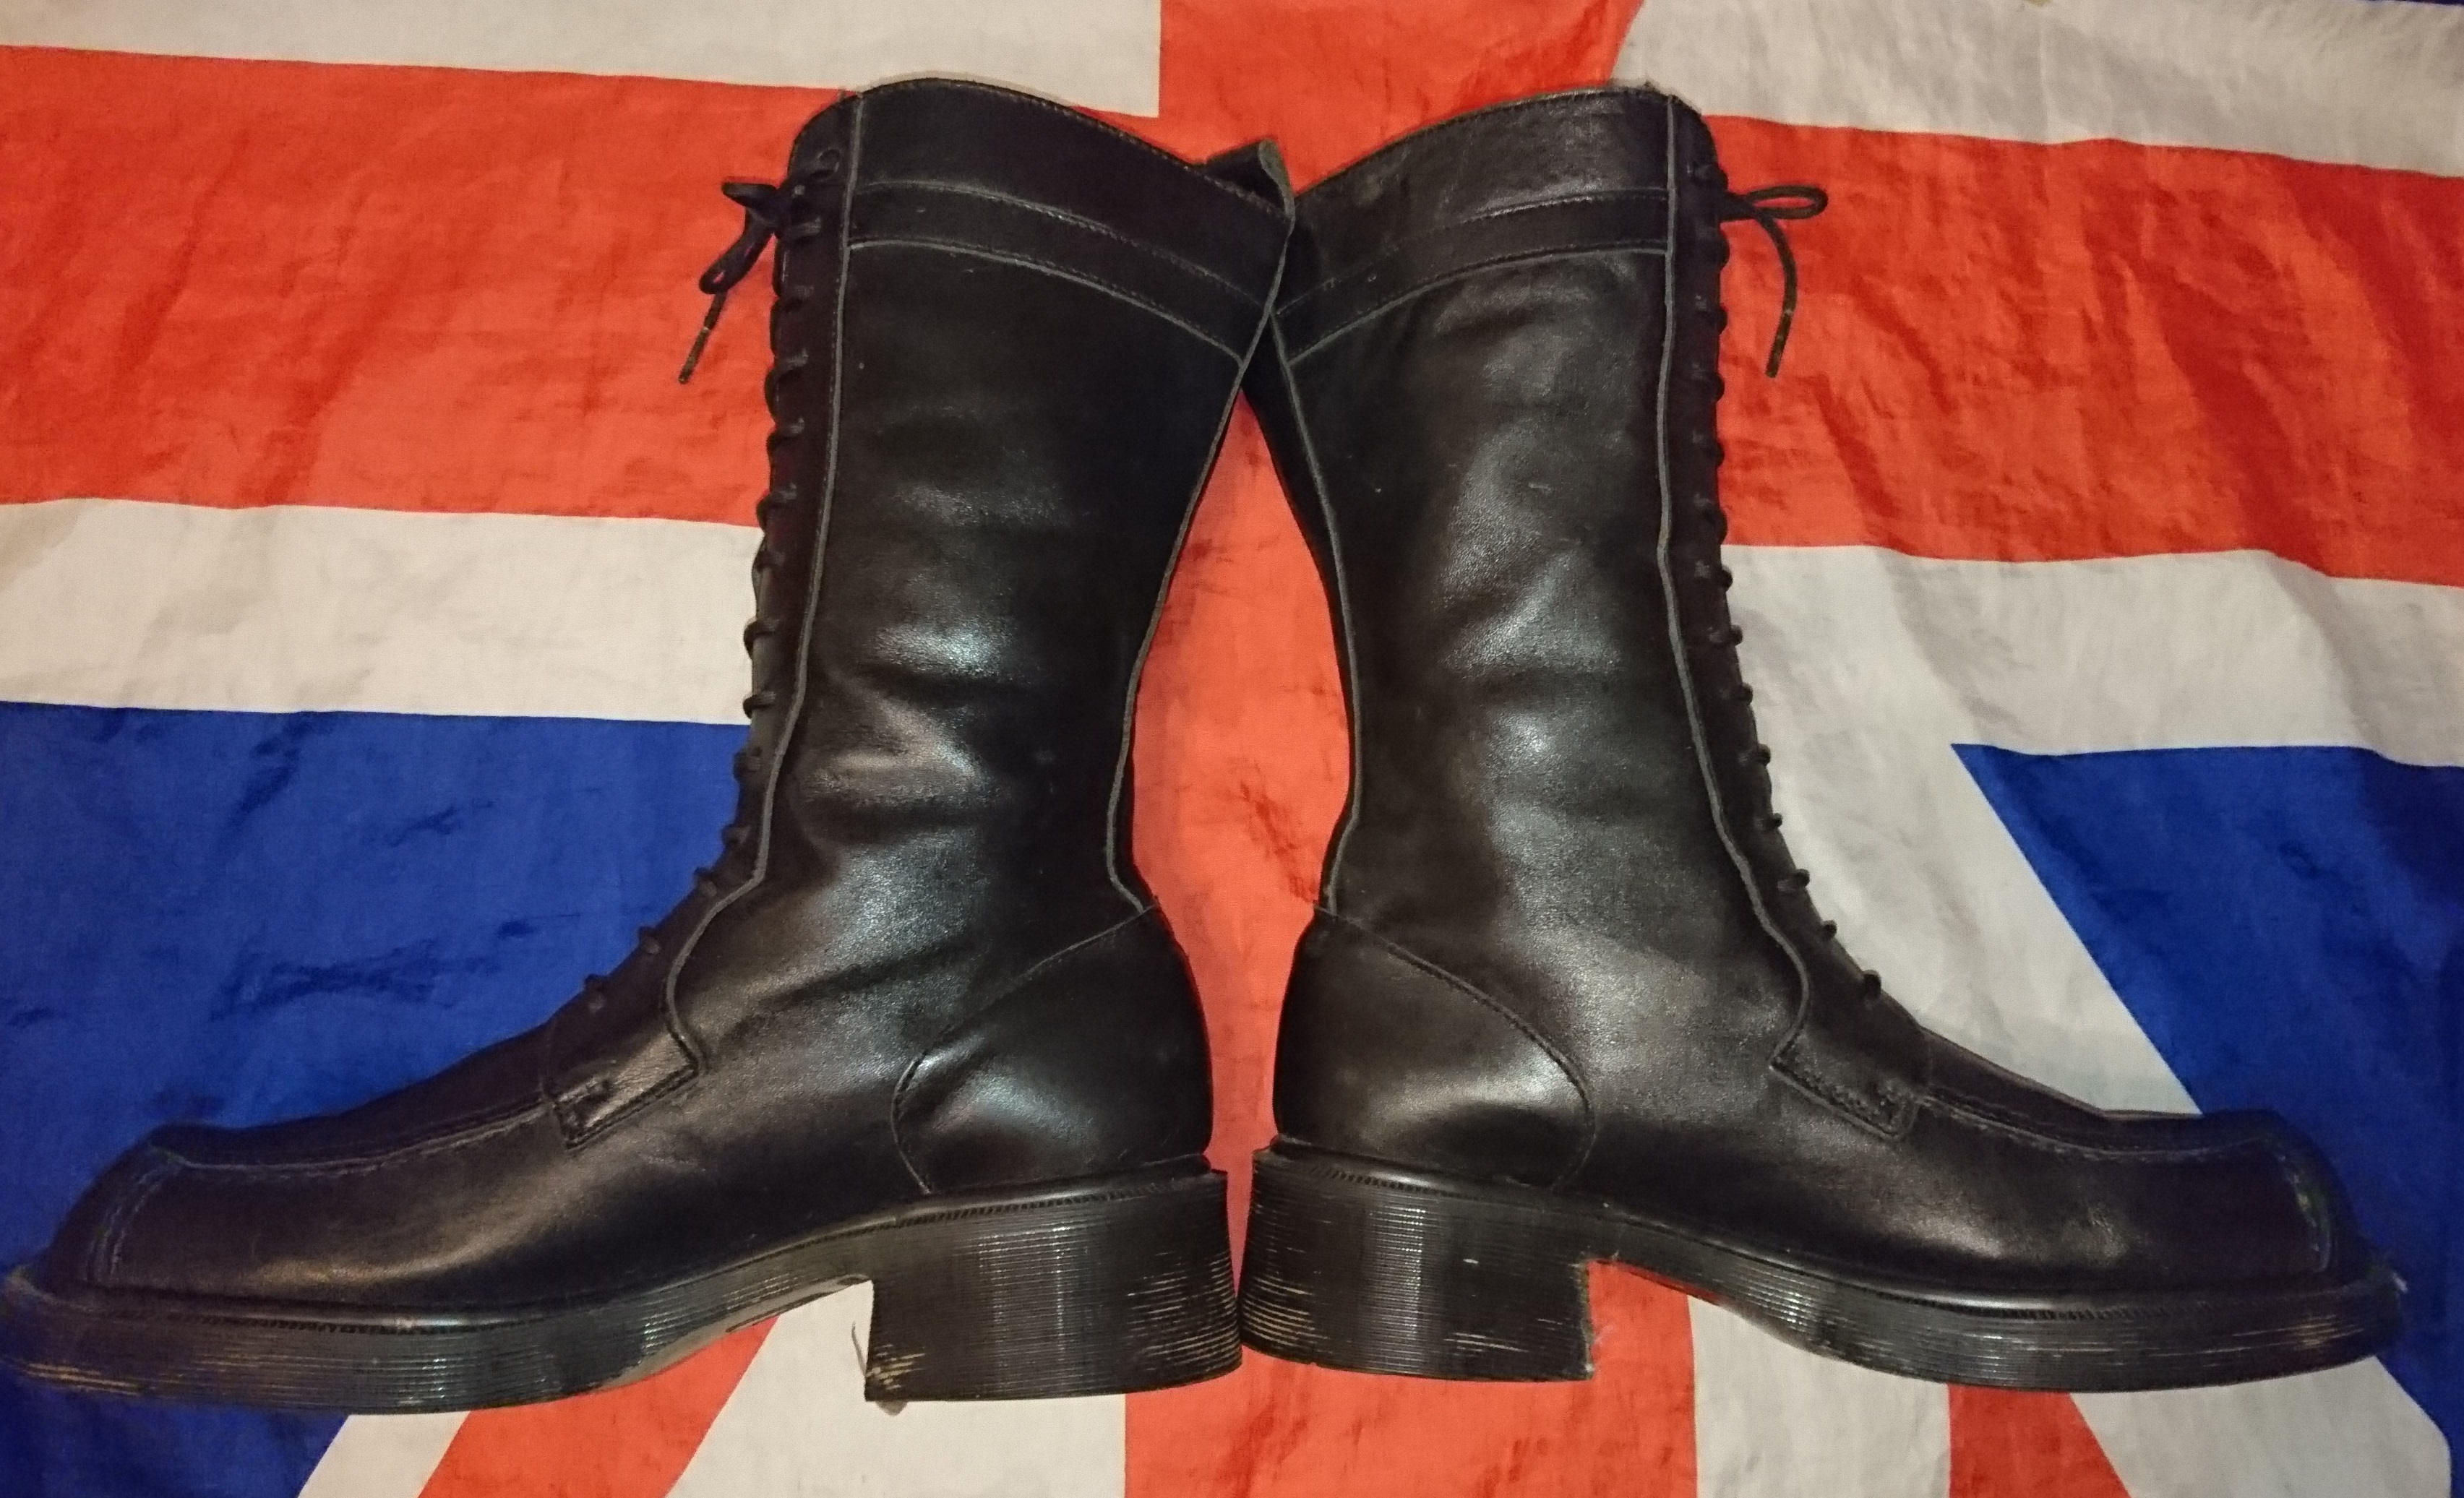 c413a6ed3 ... England Vintage - Chunky Heel Calf High Dr Doc Martens Biker Boots - UK  8* ...